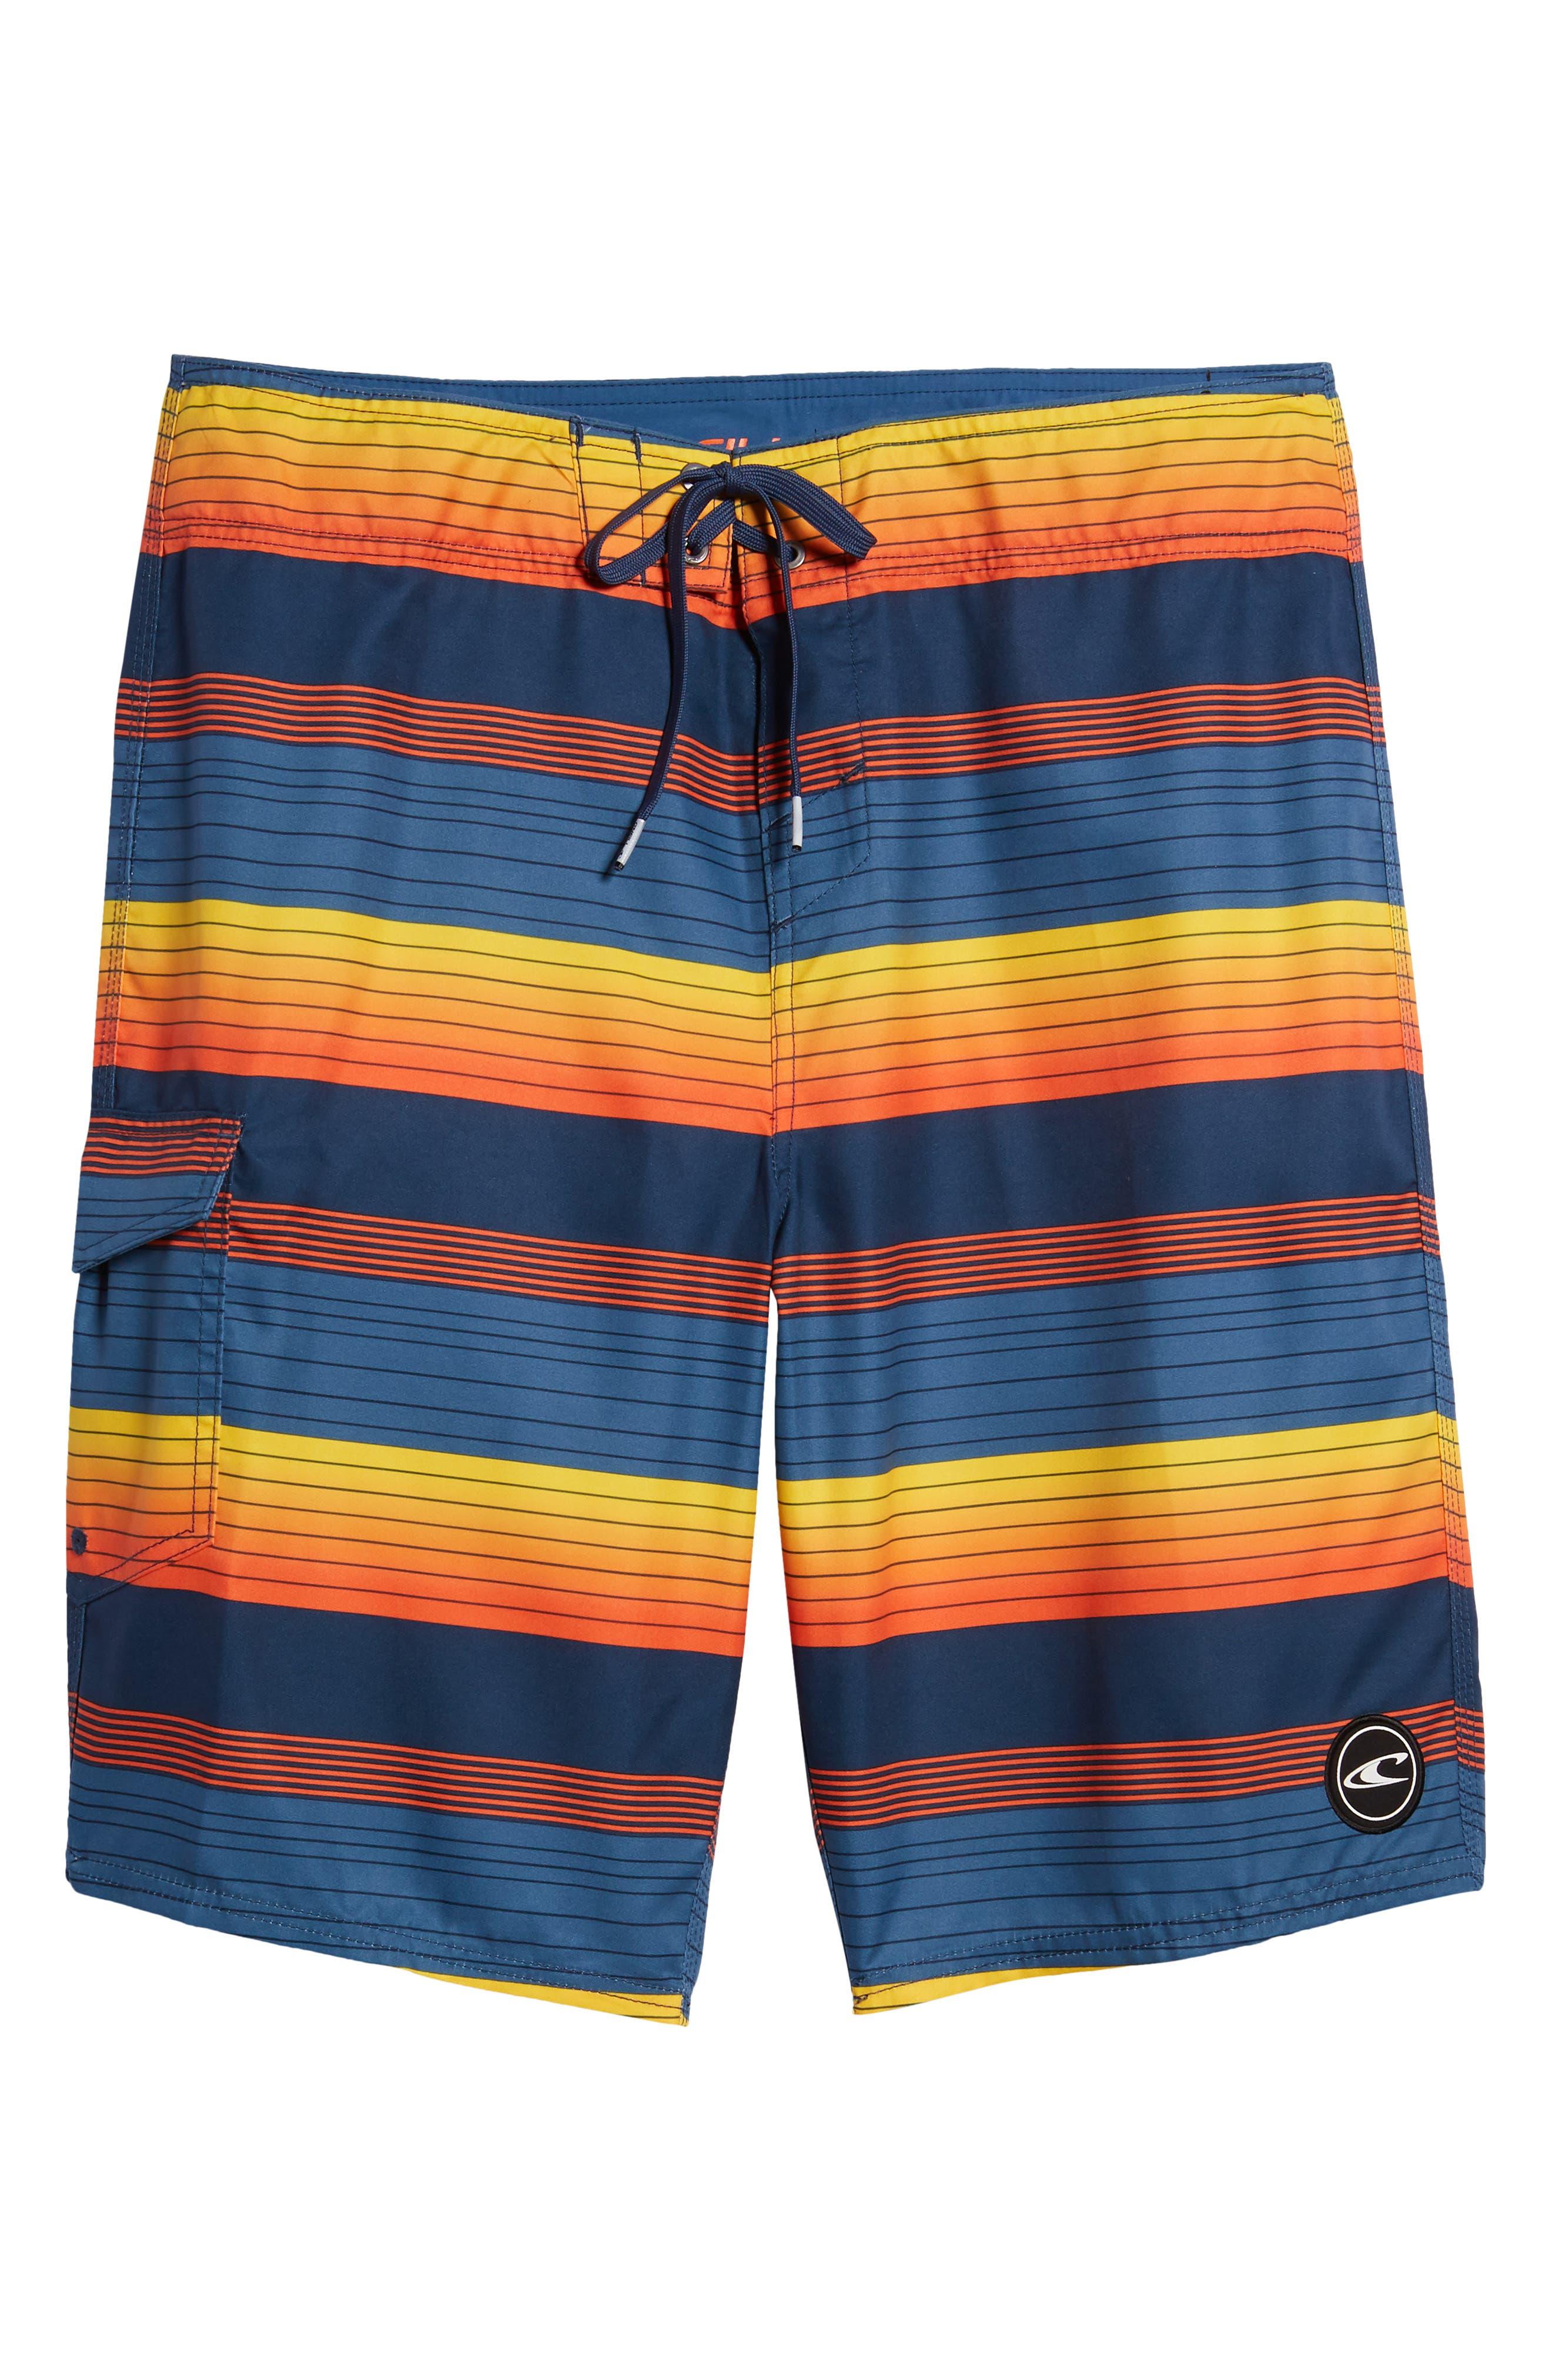 Santa Cruz Stripe Board Shorts,                             Alternate thumbnail 6, color,                             415